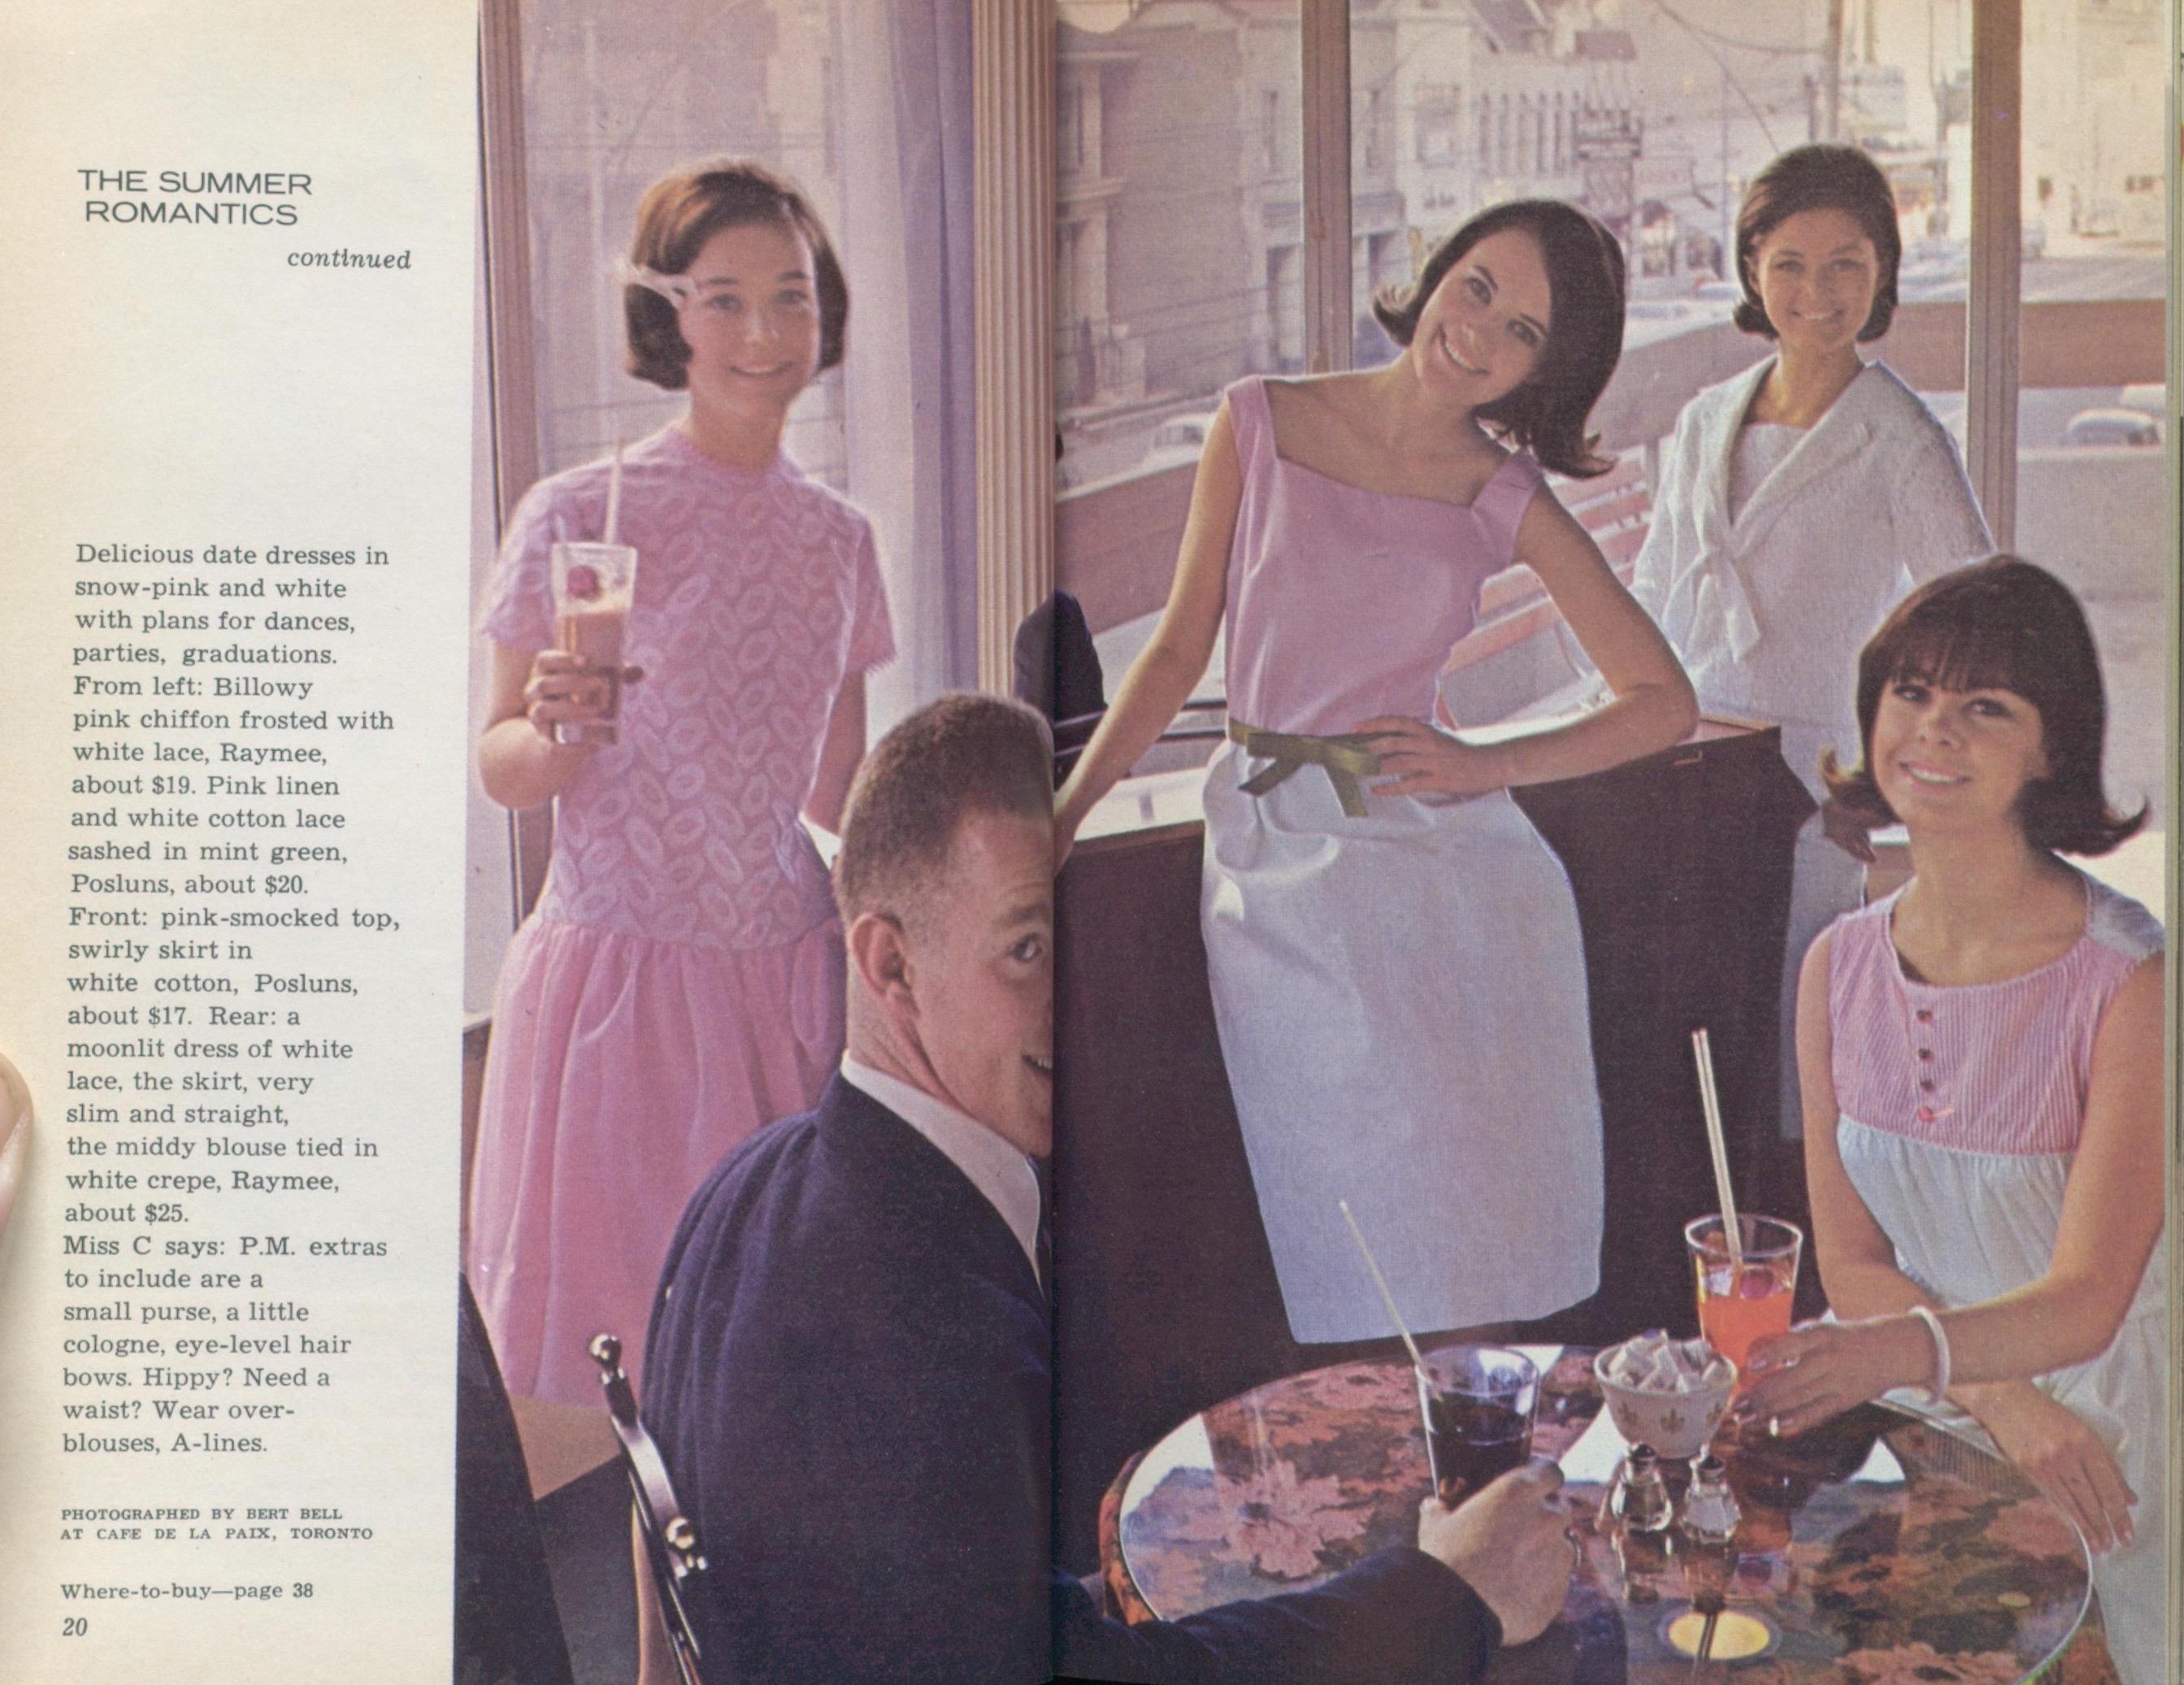 c9abec616340 105. 1964 Miss Chatelaine Volume 1 Number 1